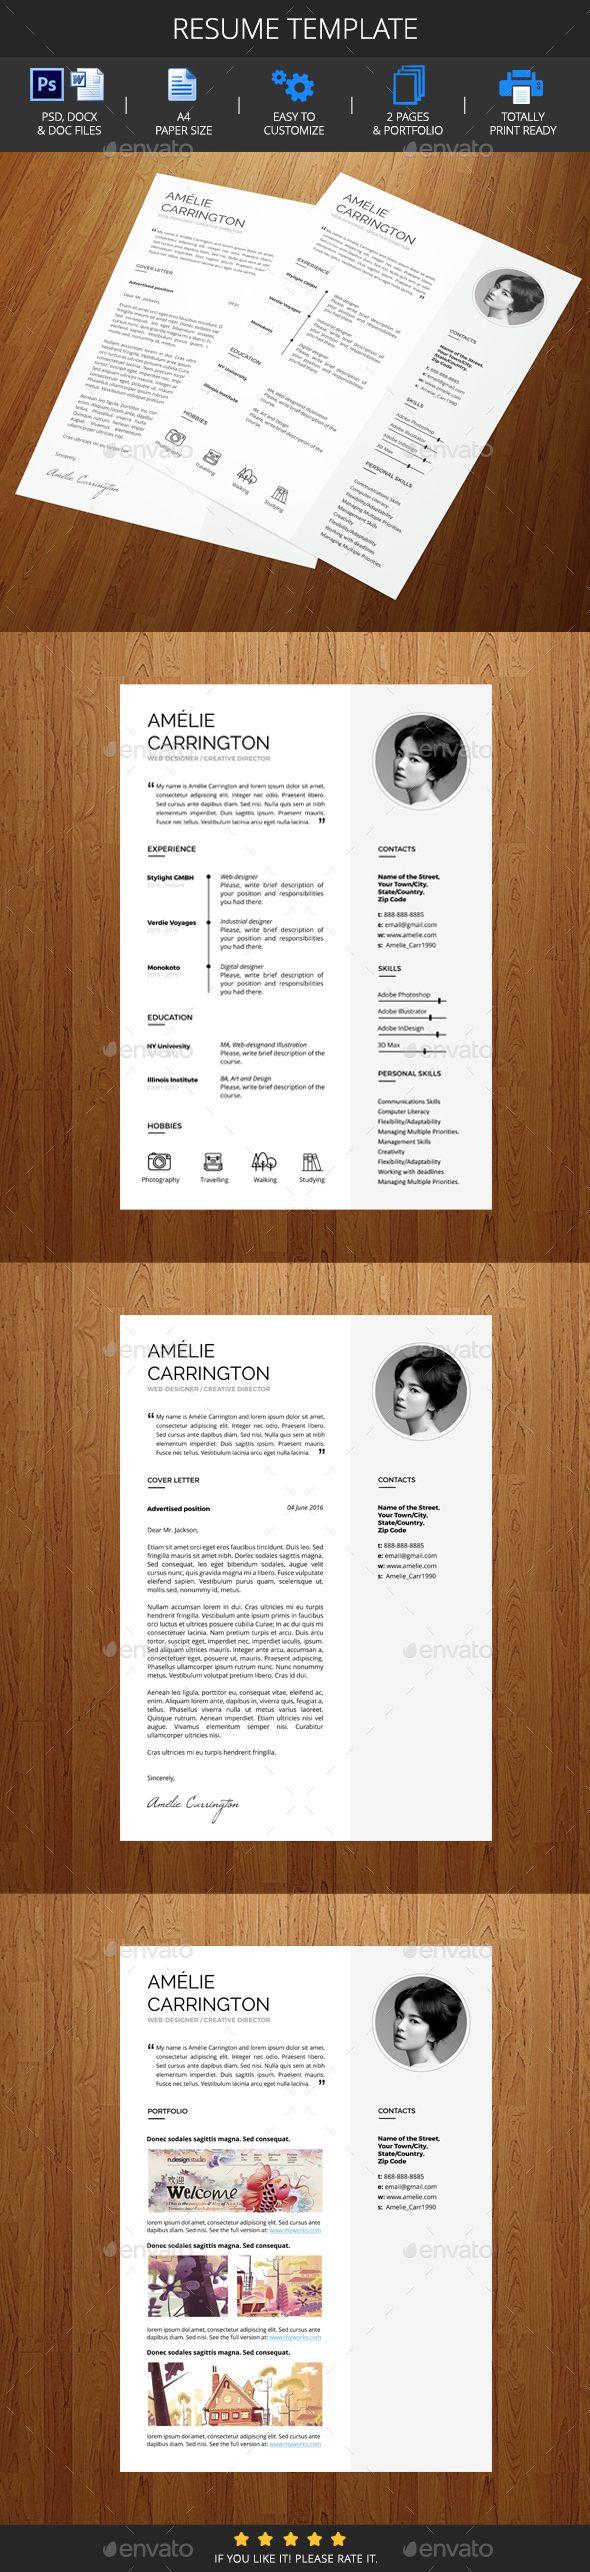 best ideas about resume design template resume 17 best ideas about resume design template resume cv design and resume design